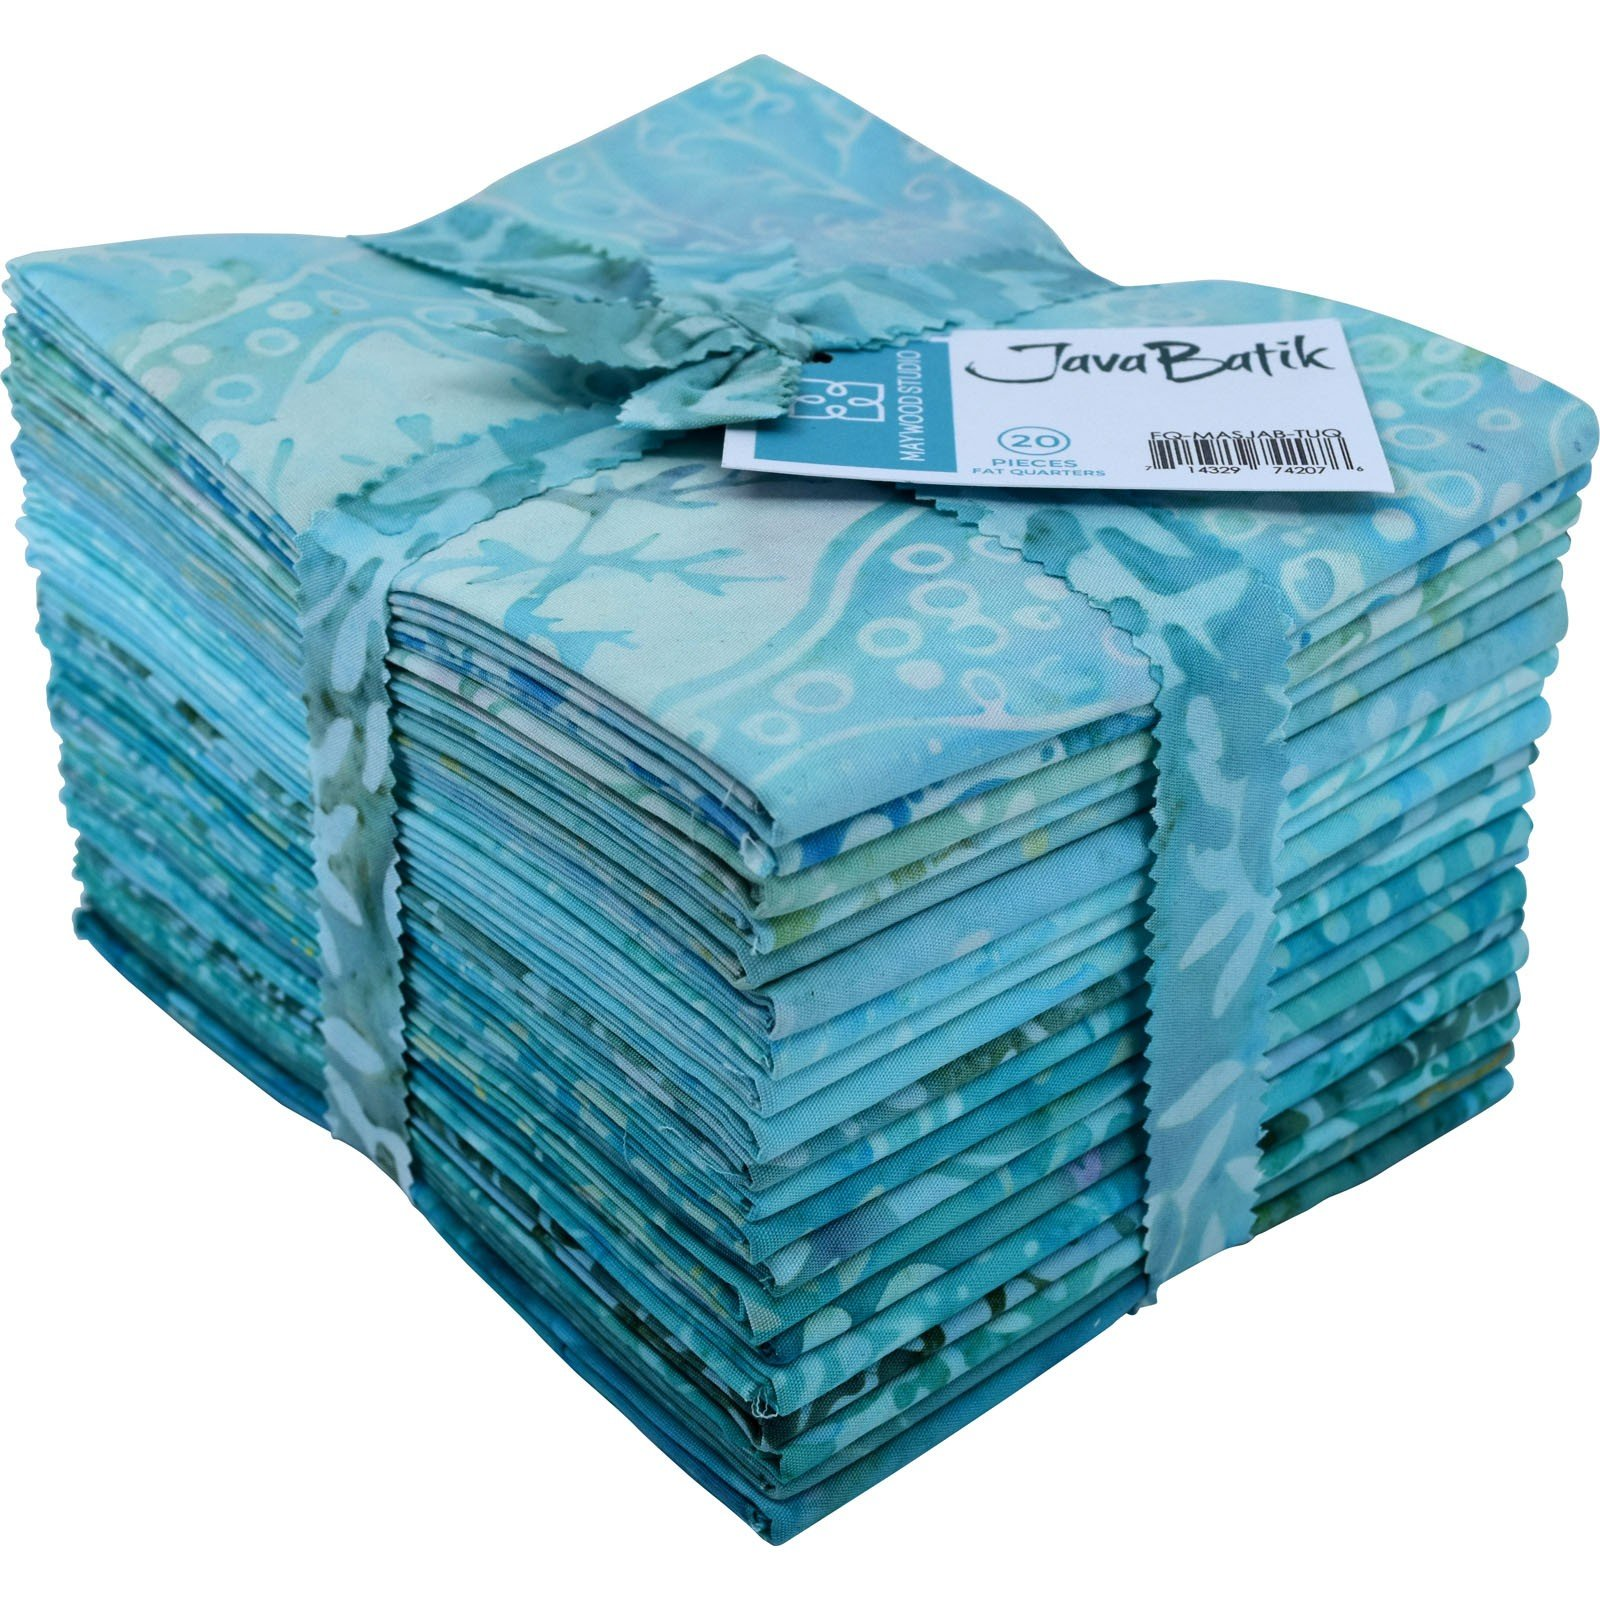 Maywood Java Batiks TURQUOISE Print Bundles Fat Quarters (20)